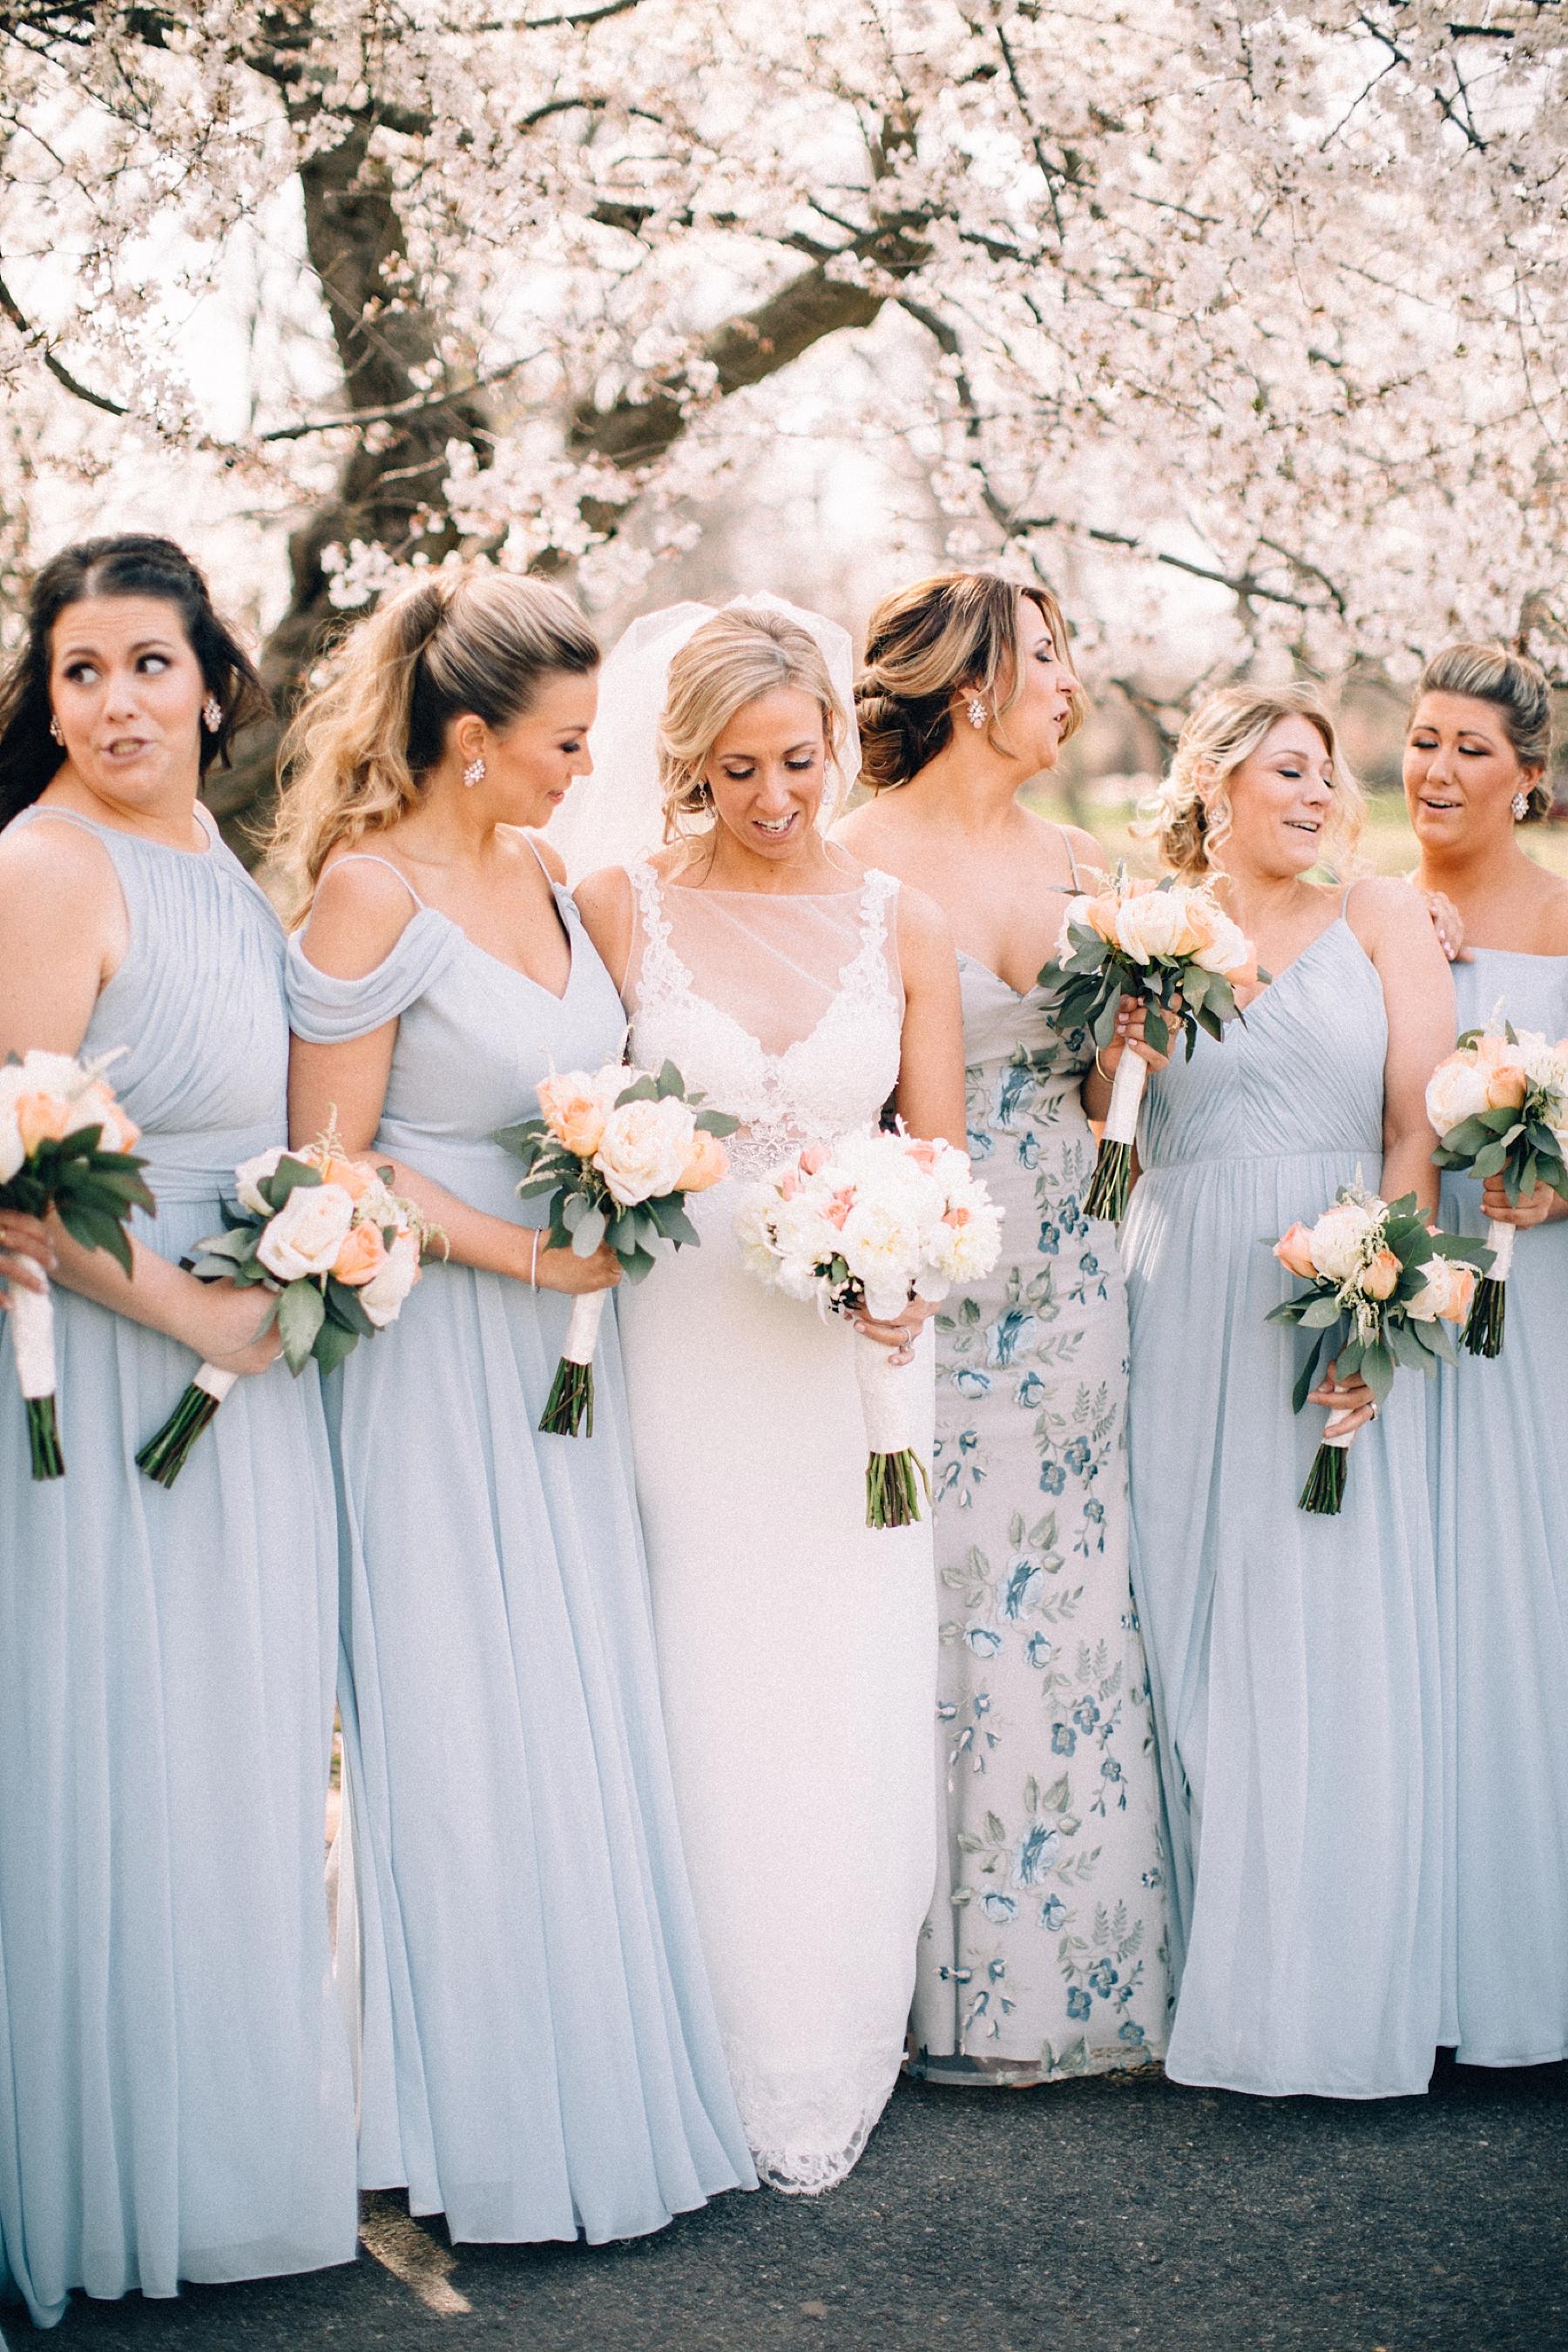 cranford-washington-nj-wedding-photographer-seasons_0020.jpg